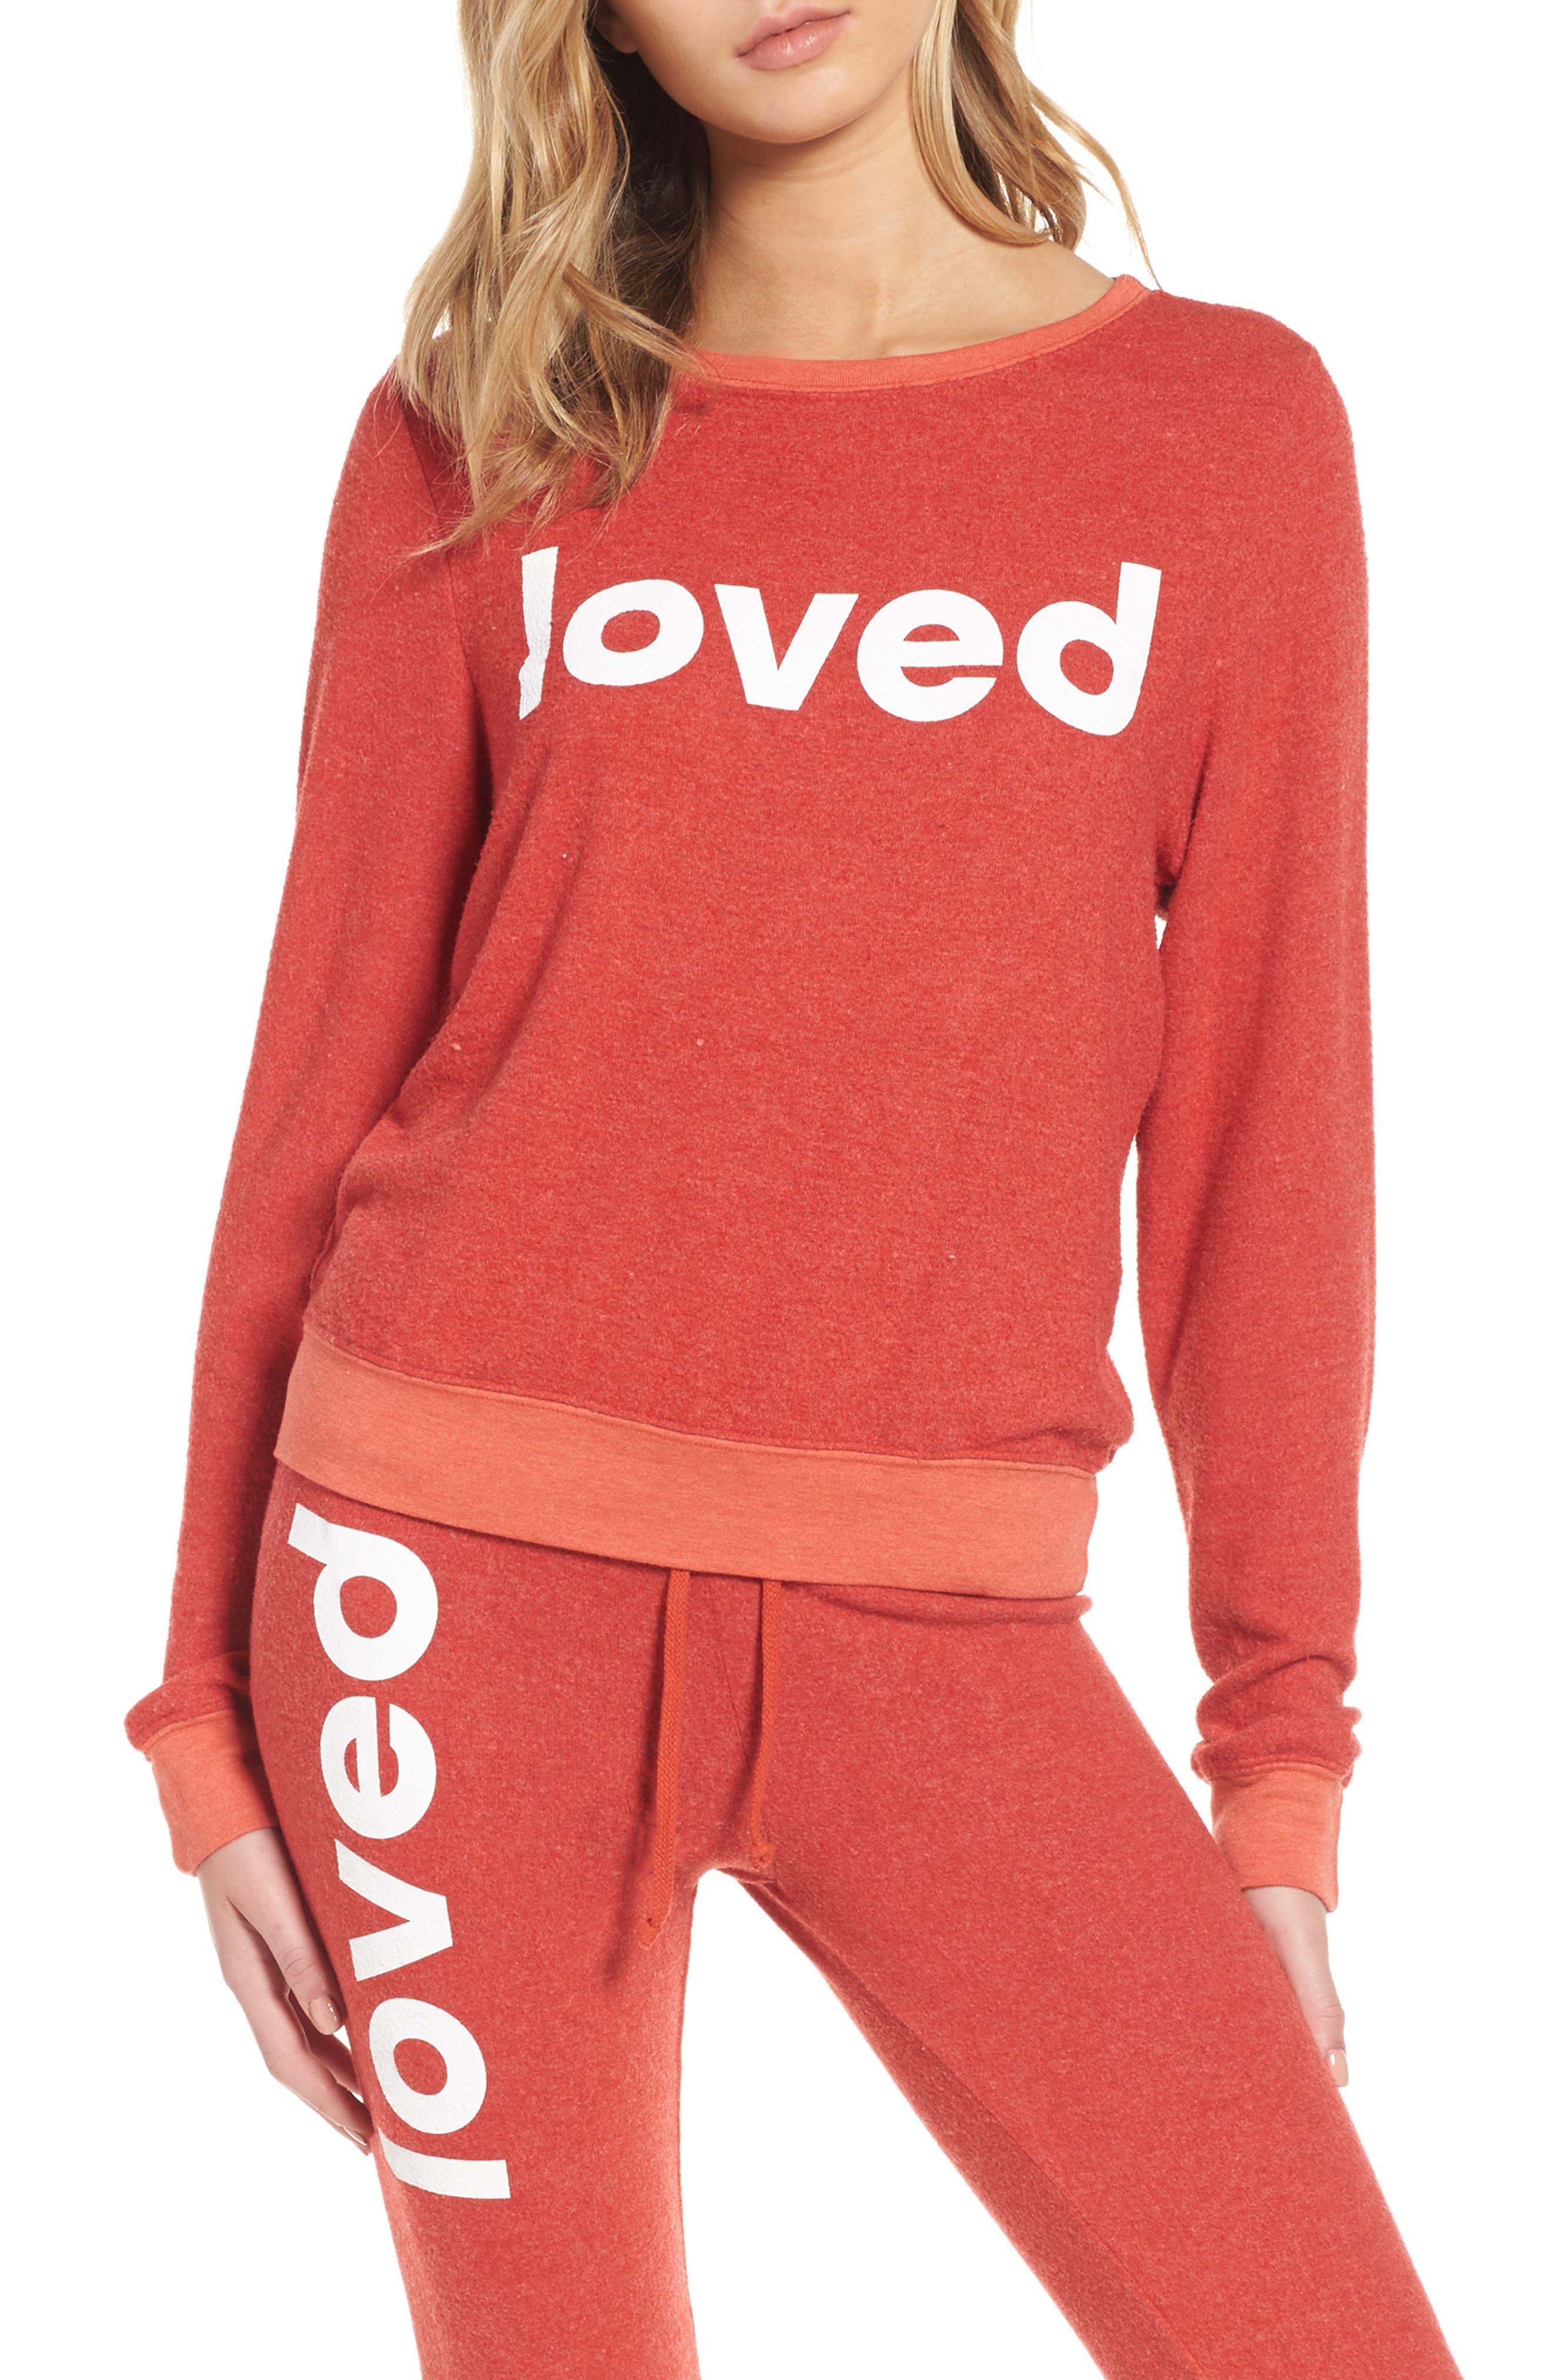 Alternate Image 1 Selected - Dream Scene Loved Sweatshirt